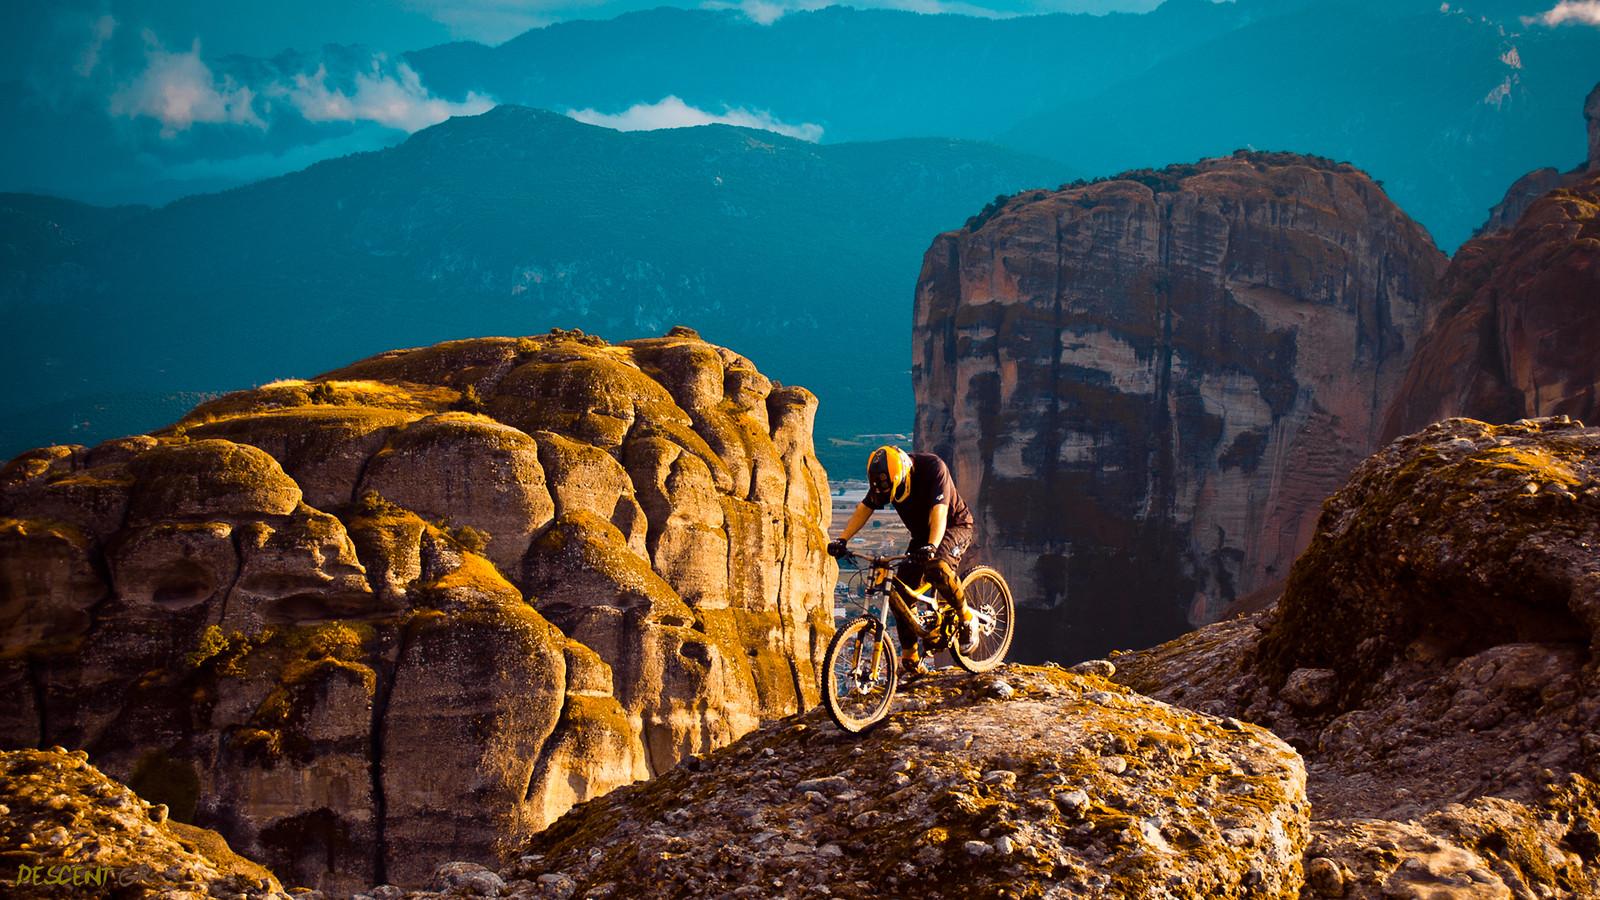 Meteora 3 - altereg0 - Mountain Biking Pictures - Vital MTB